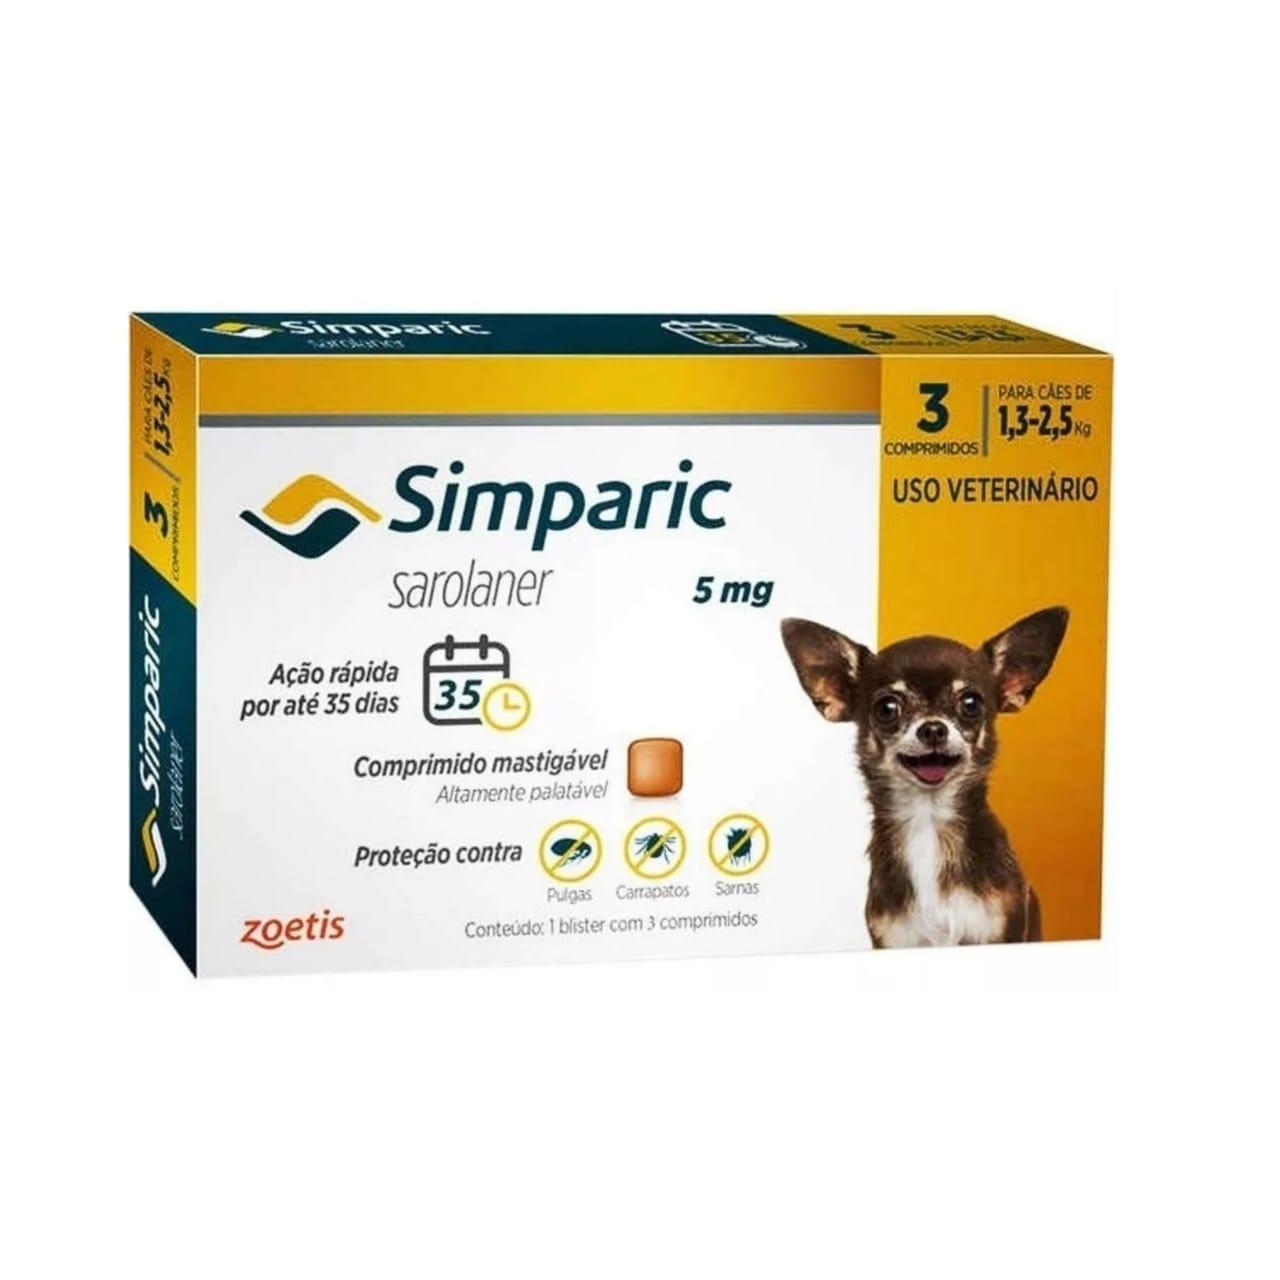 Antipulgas e Carrapatos Simparic 5mg 1,3 a 2,5 Kg - 3 Comprimidos